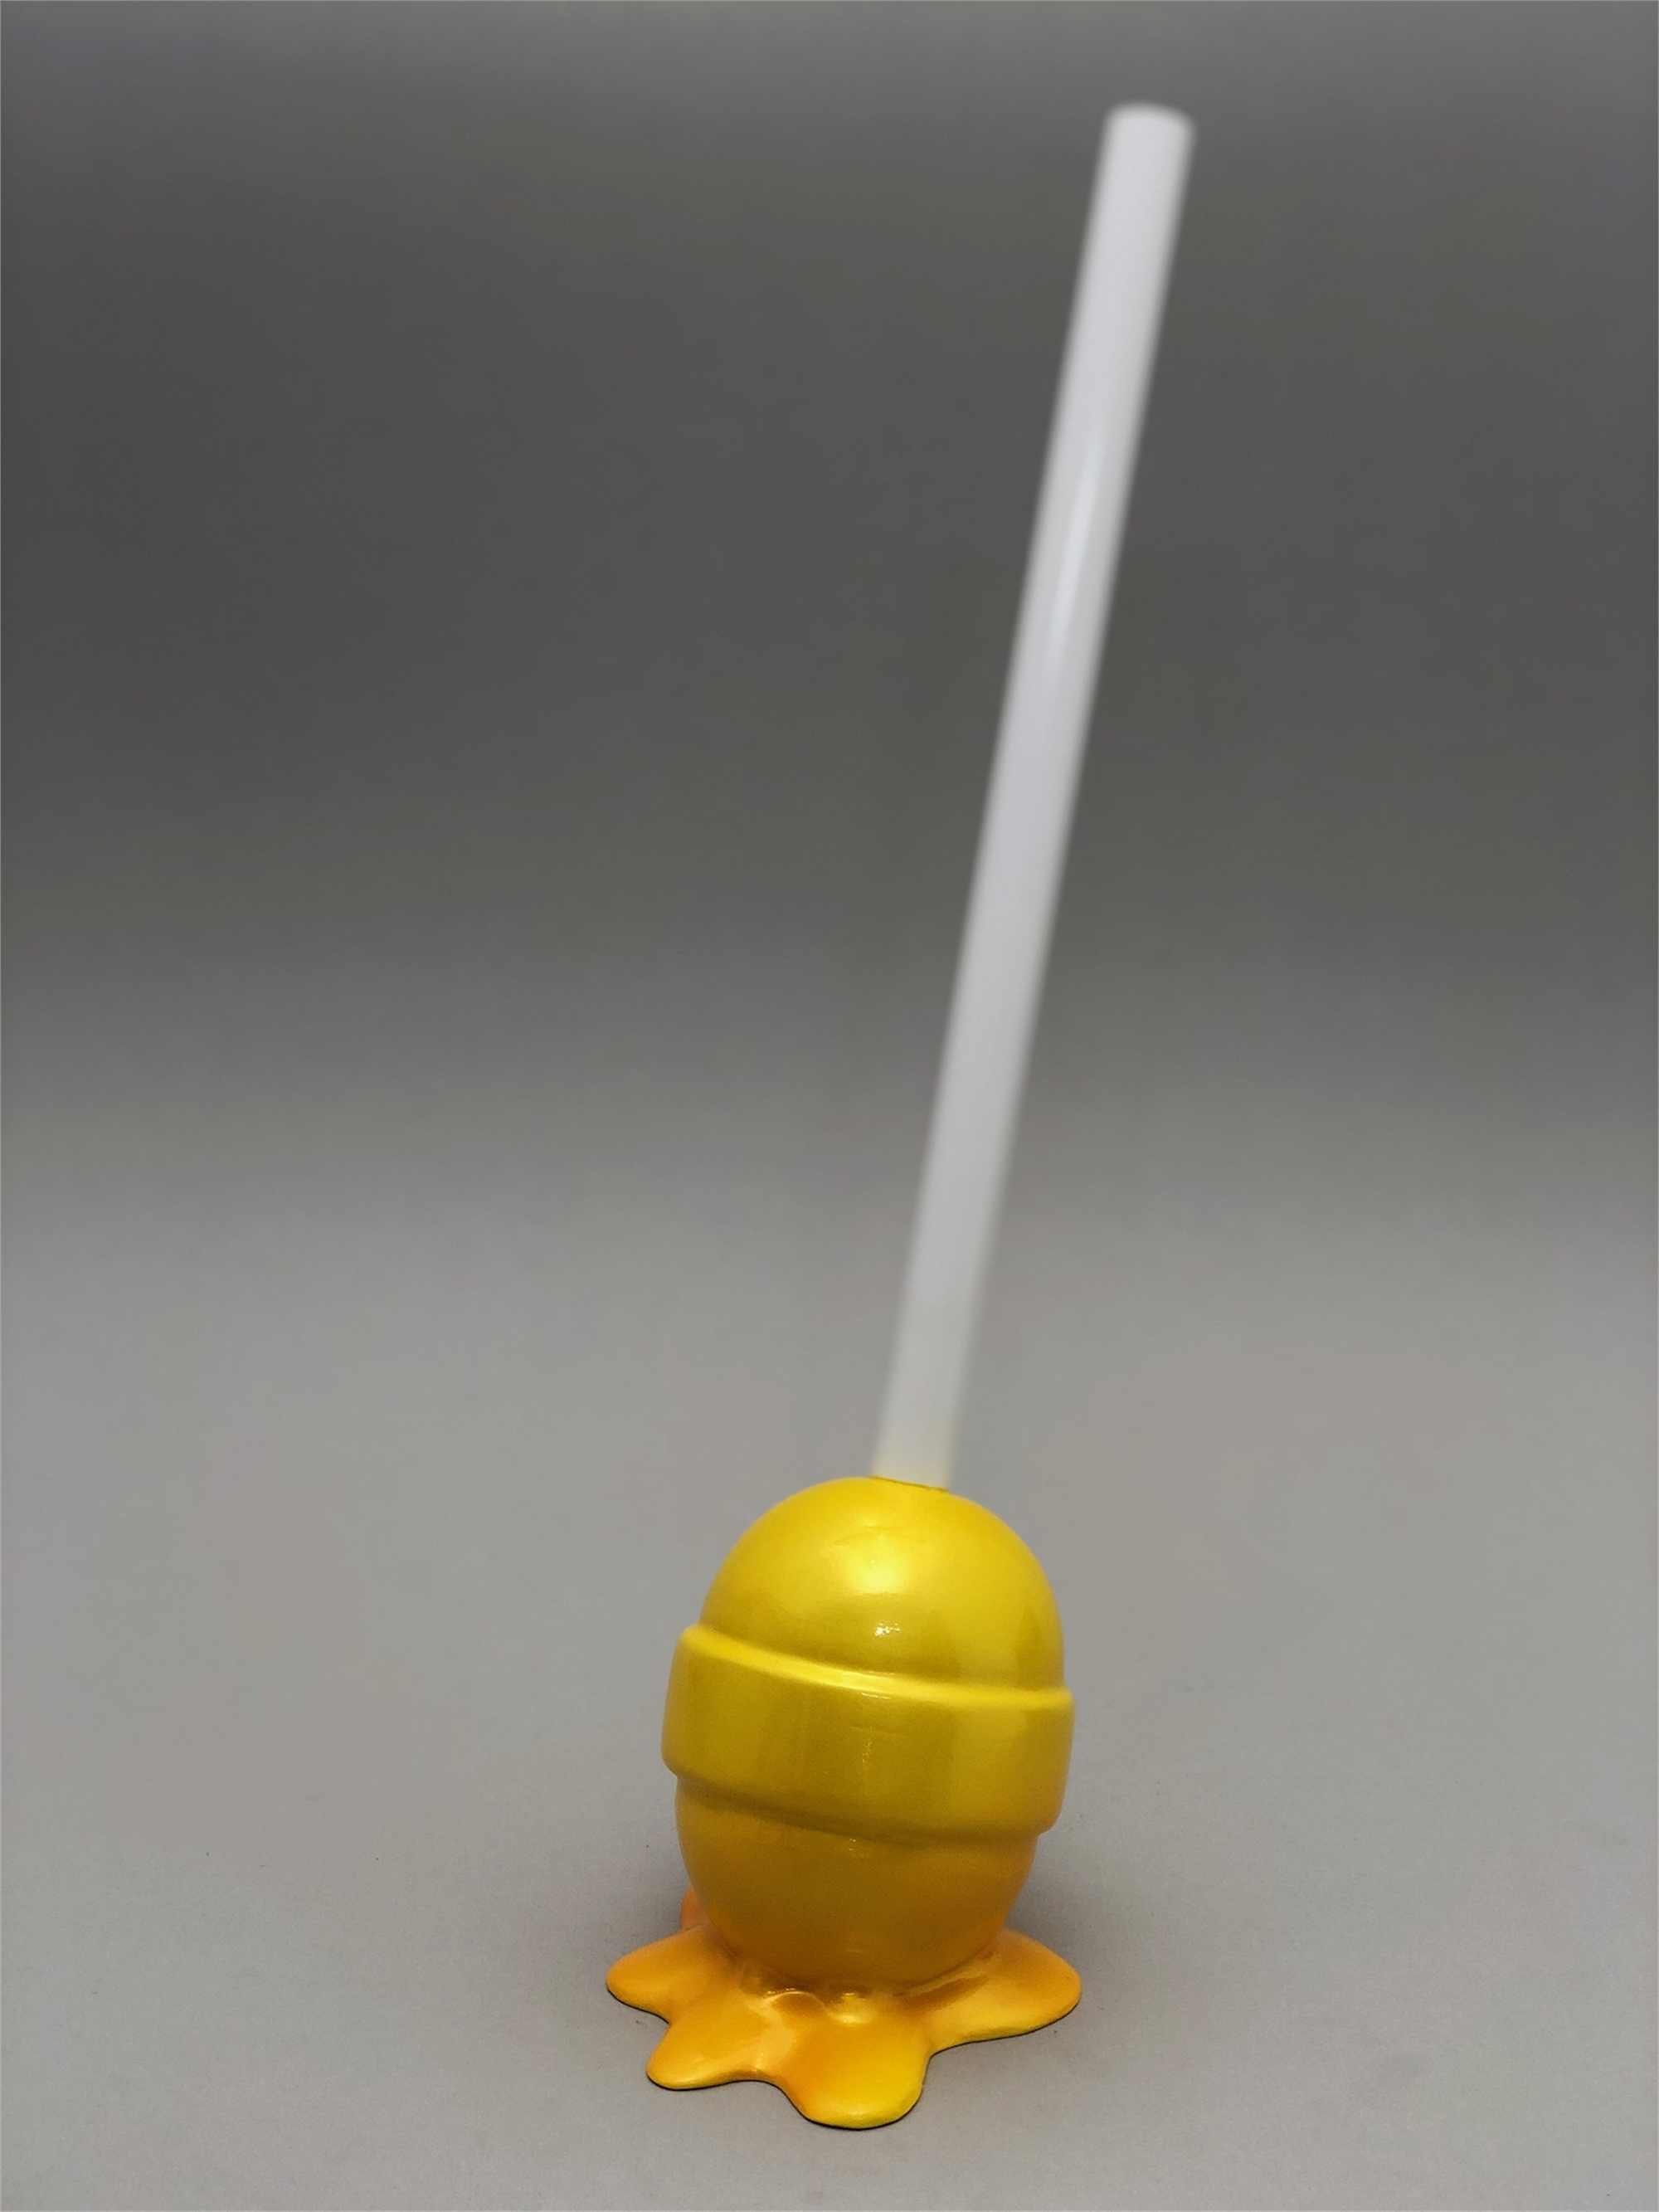 The Sweet Life, small, yellow Lollipop by Elena Bulatova